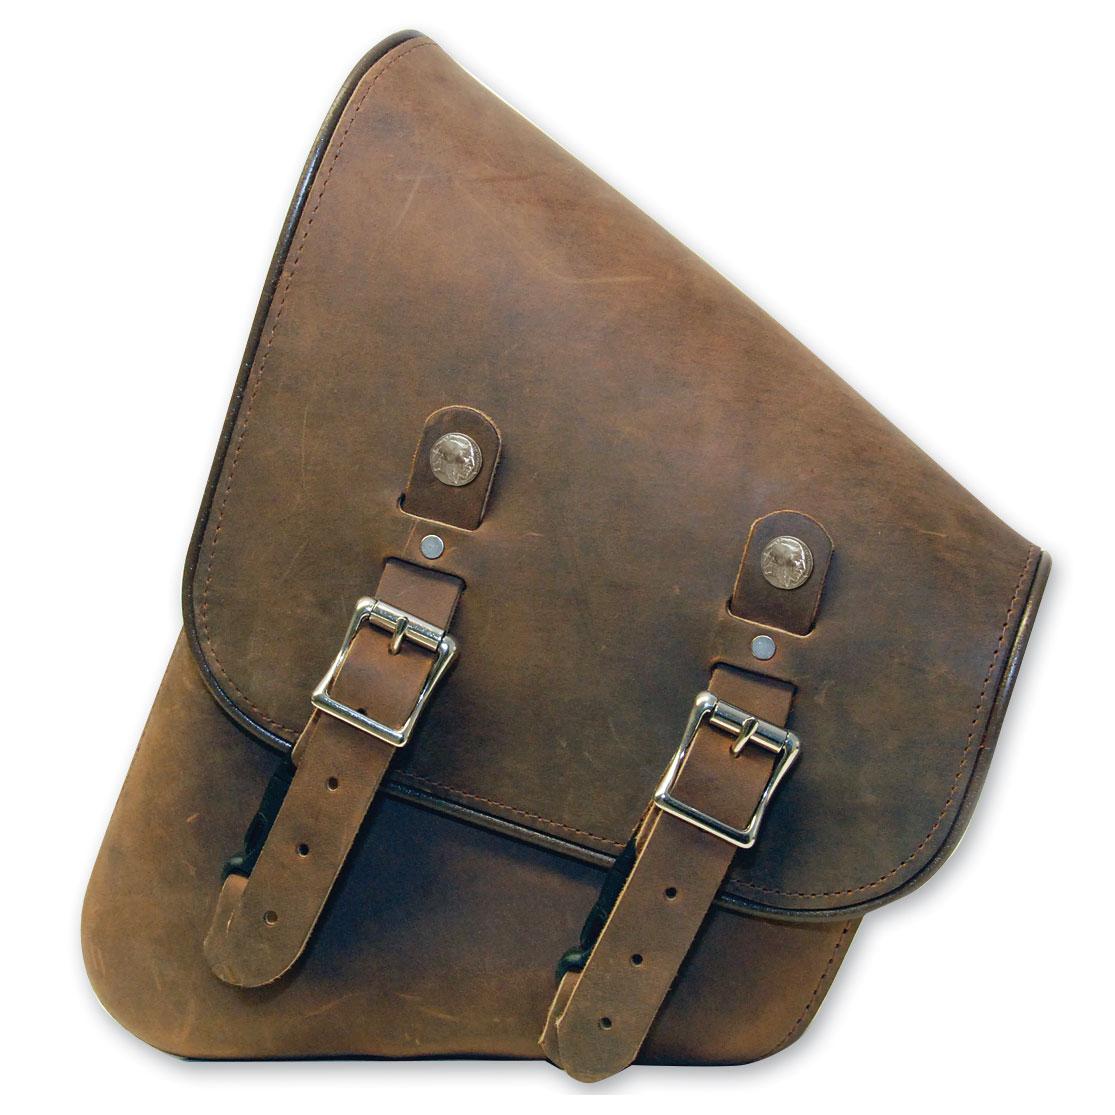 d090a1df1 Leatherworks, Inc. Distressed Brown Leather Swingarm Bag - 312LDB ...